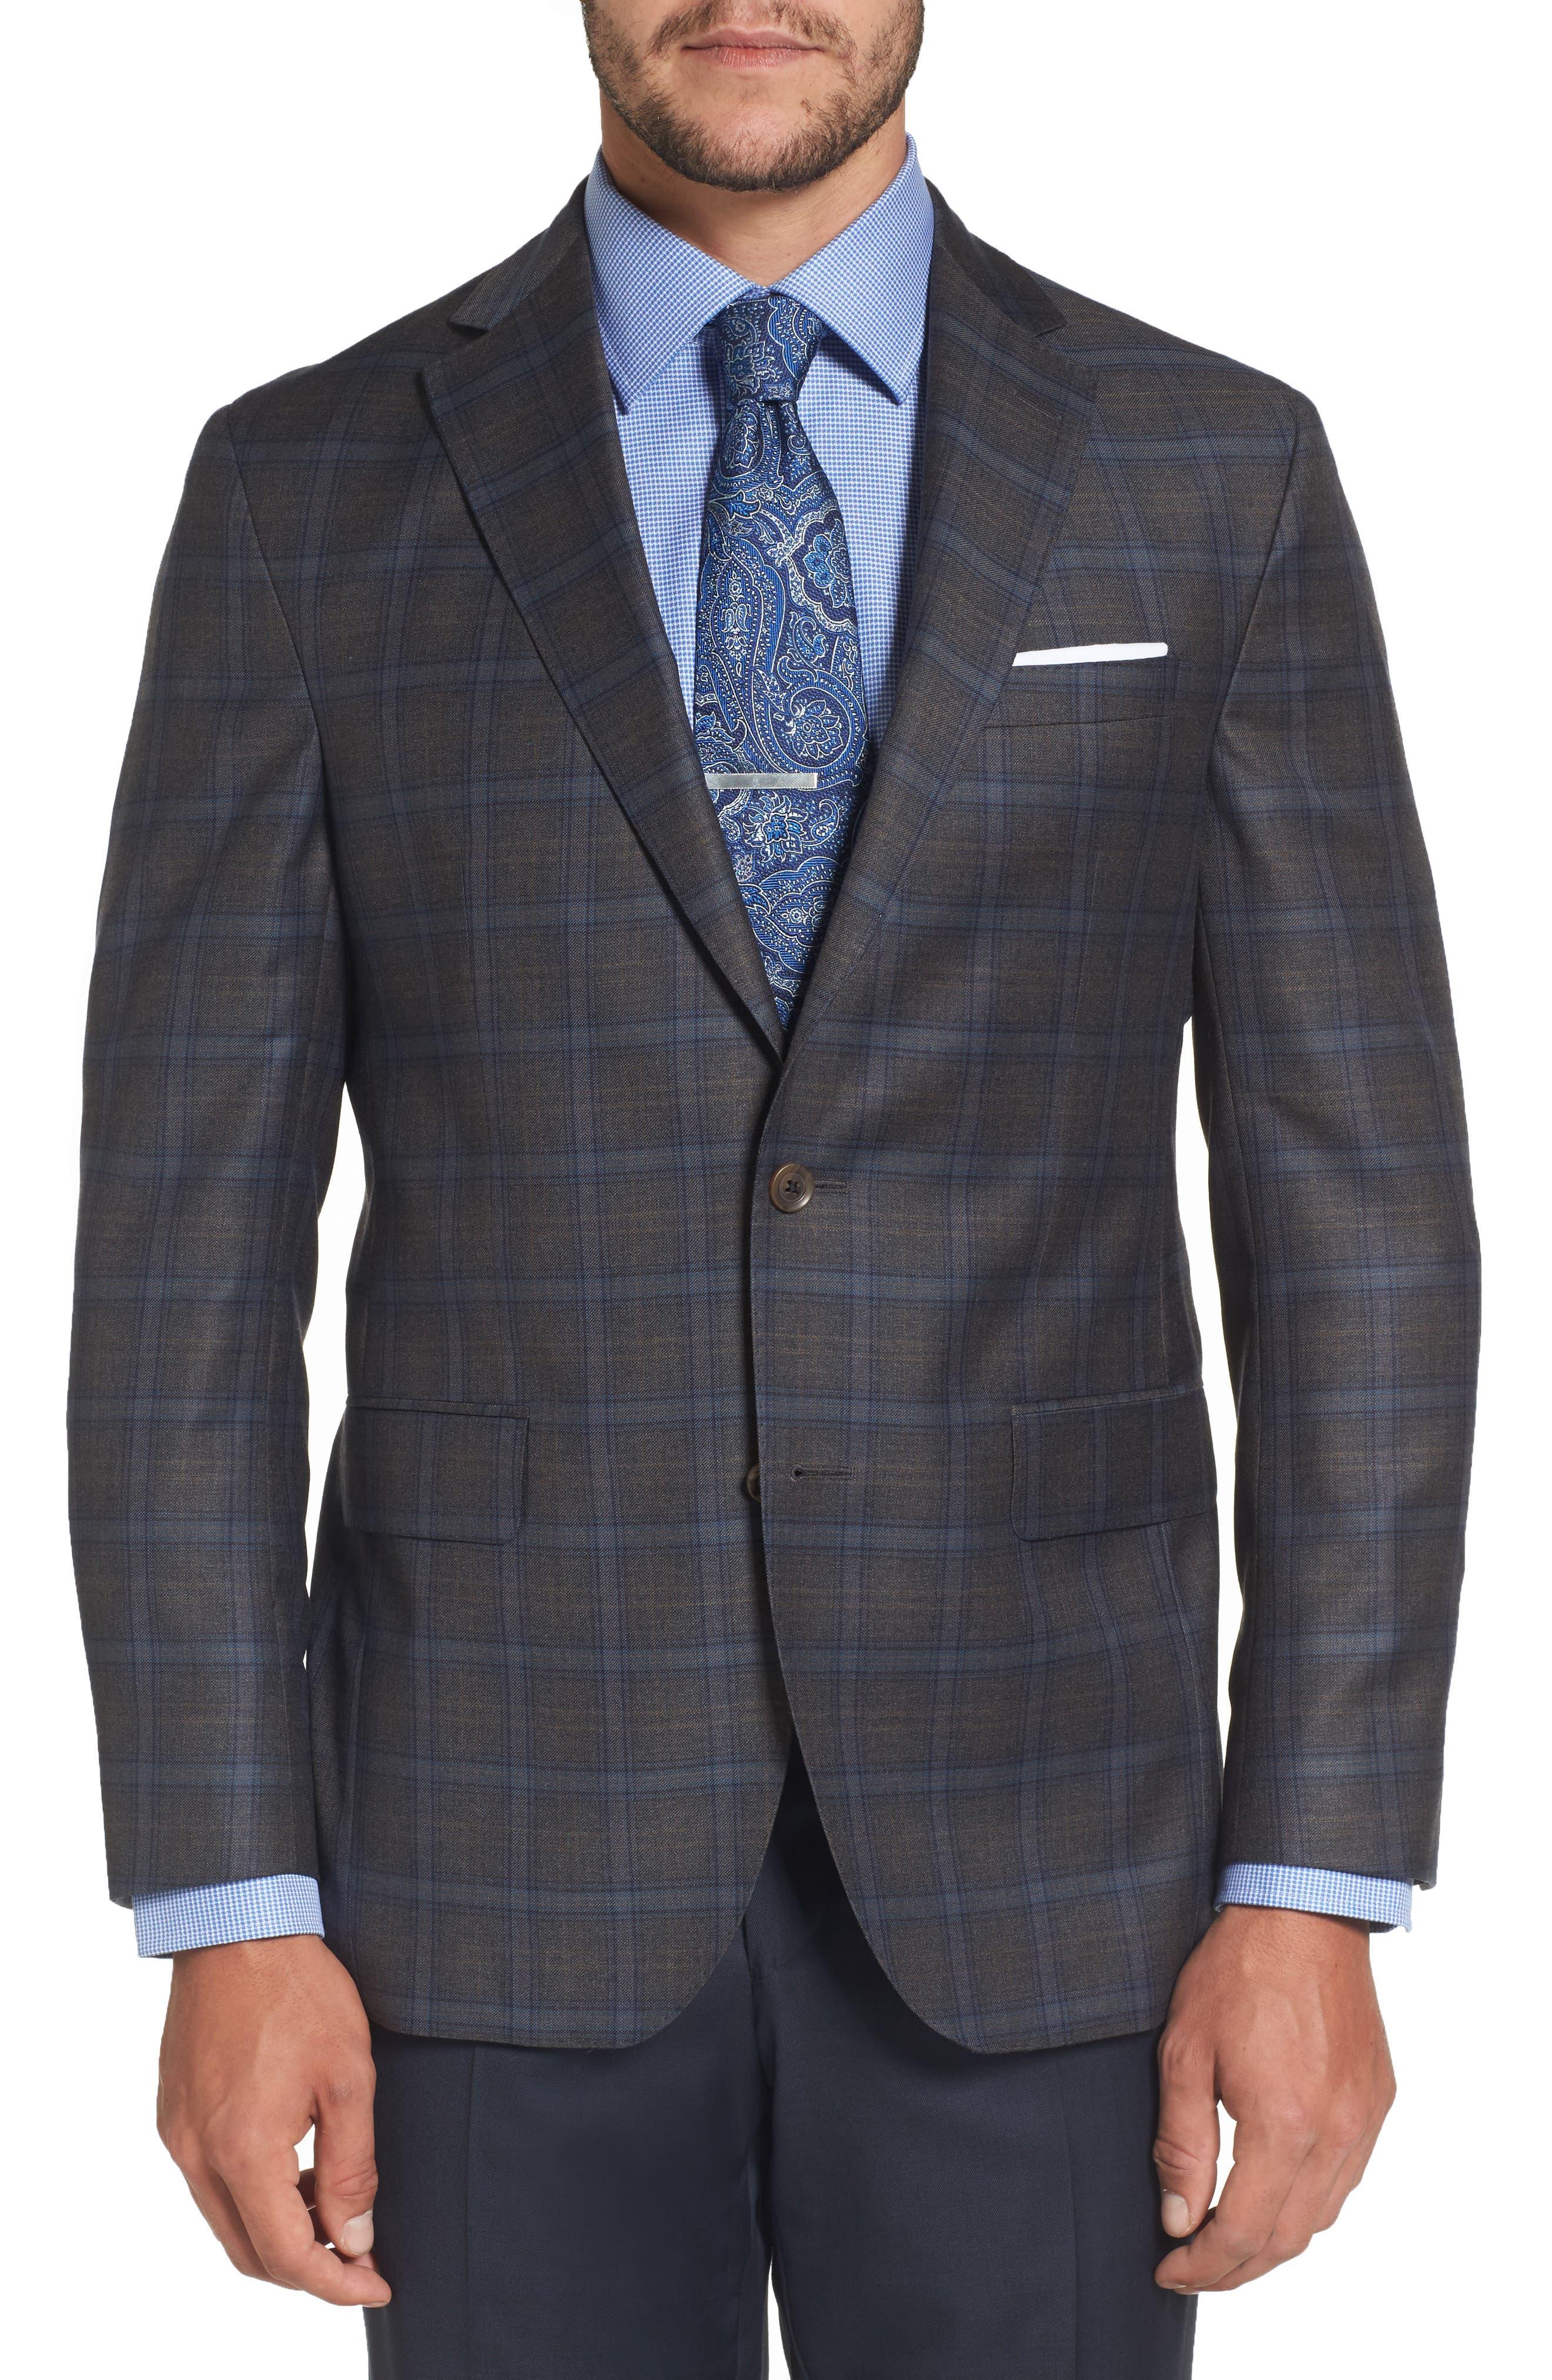 Alternate Image 1 Selected - David Donahue Arnold Classic Fit Plaid Wool Sport Coat